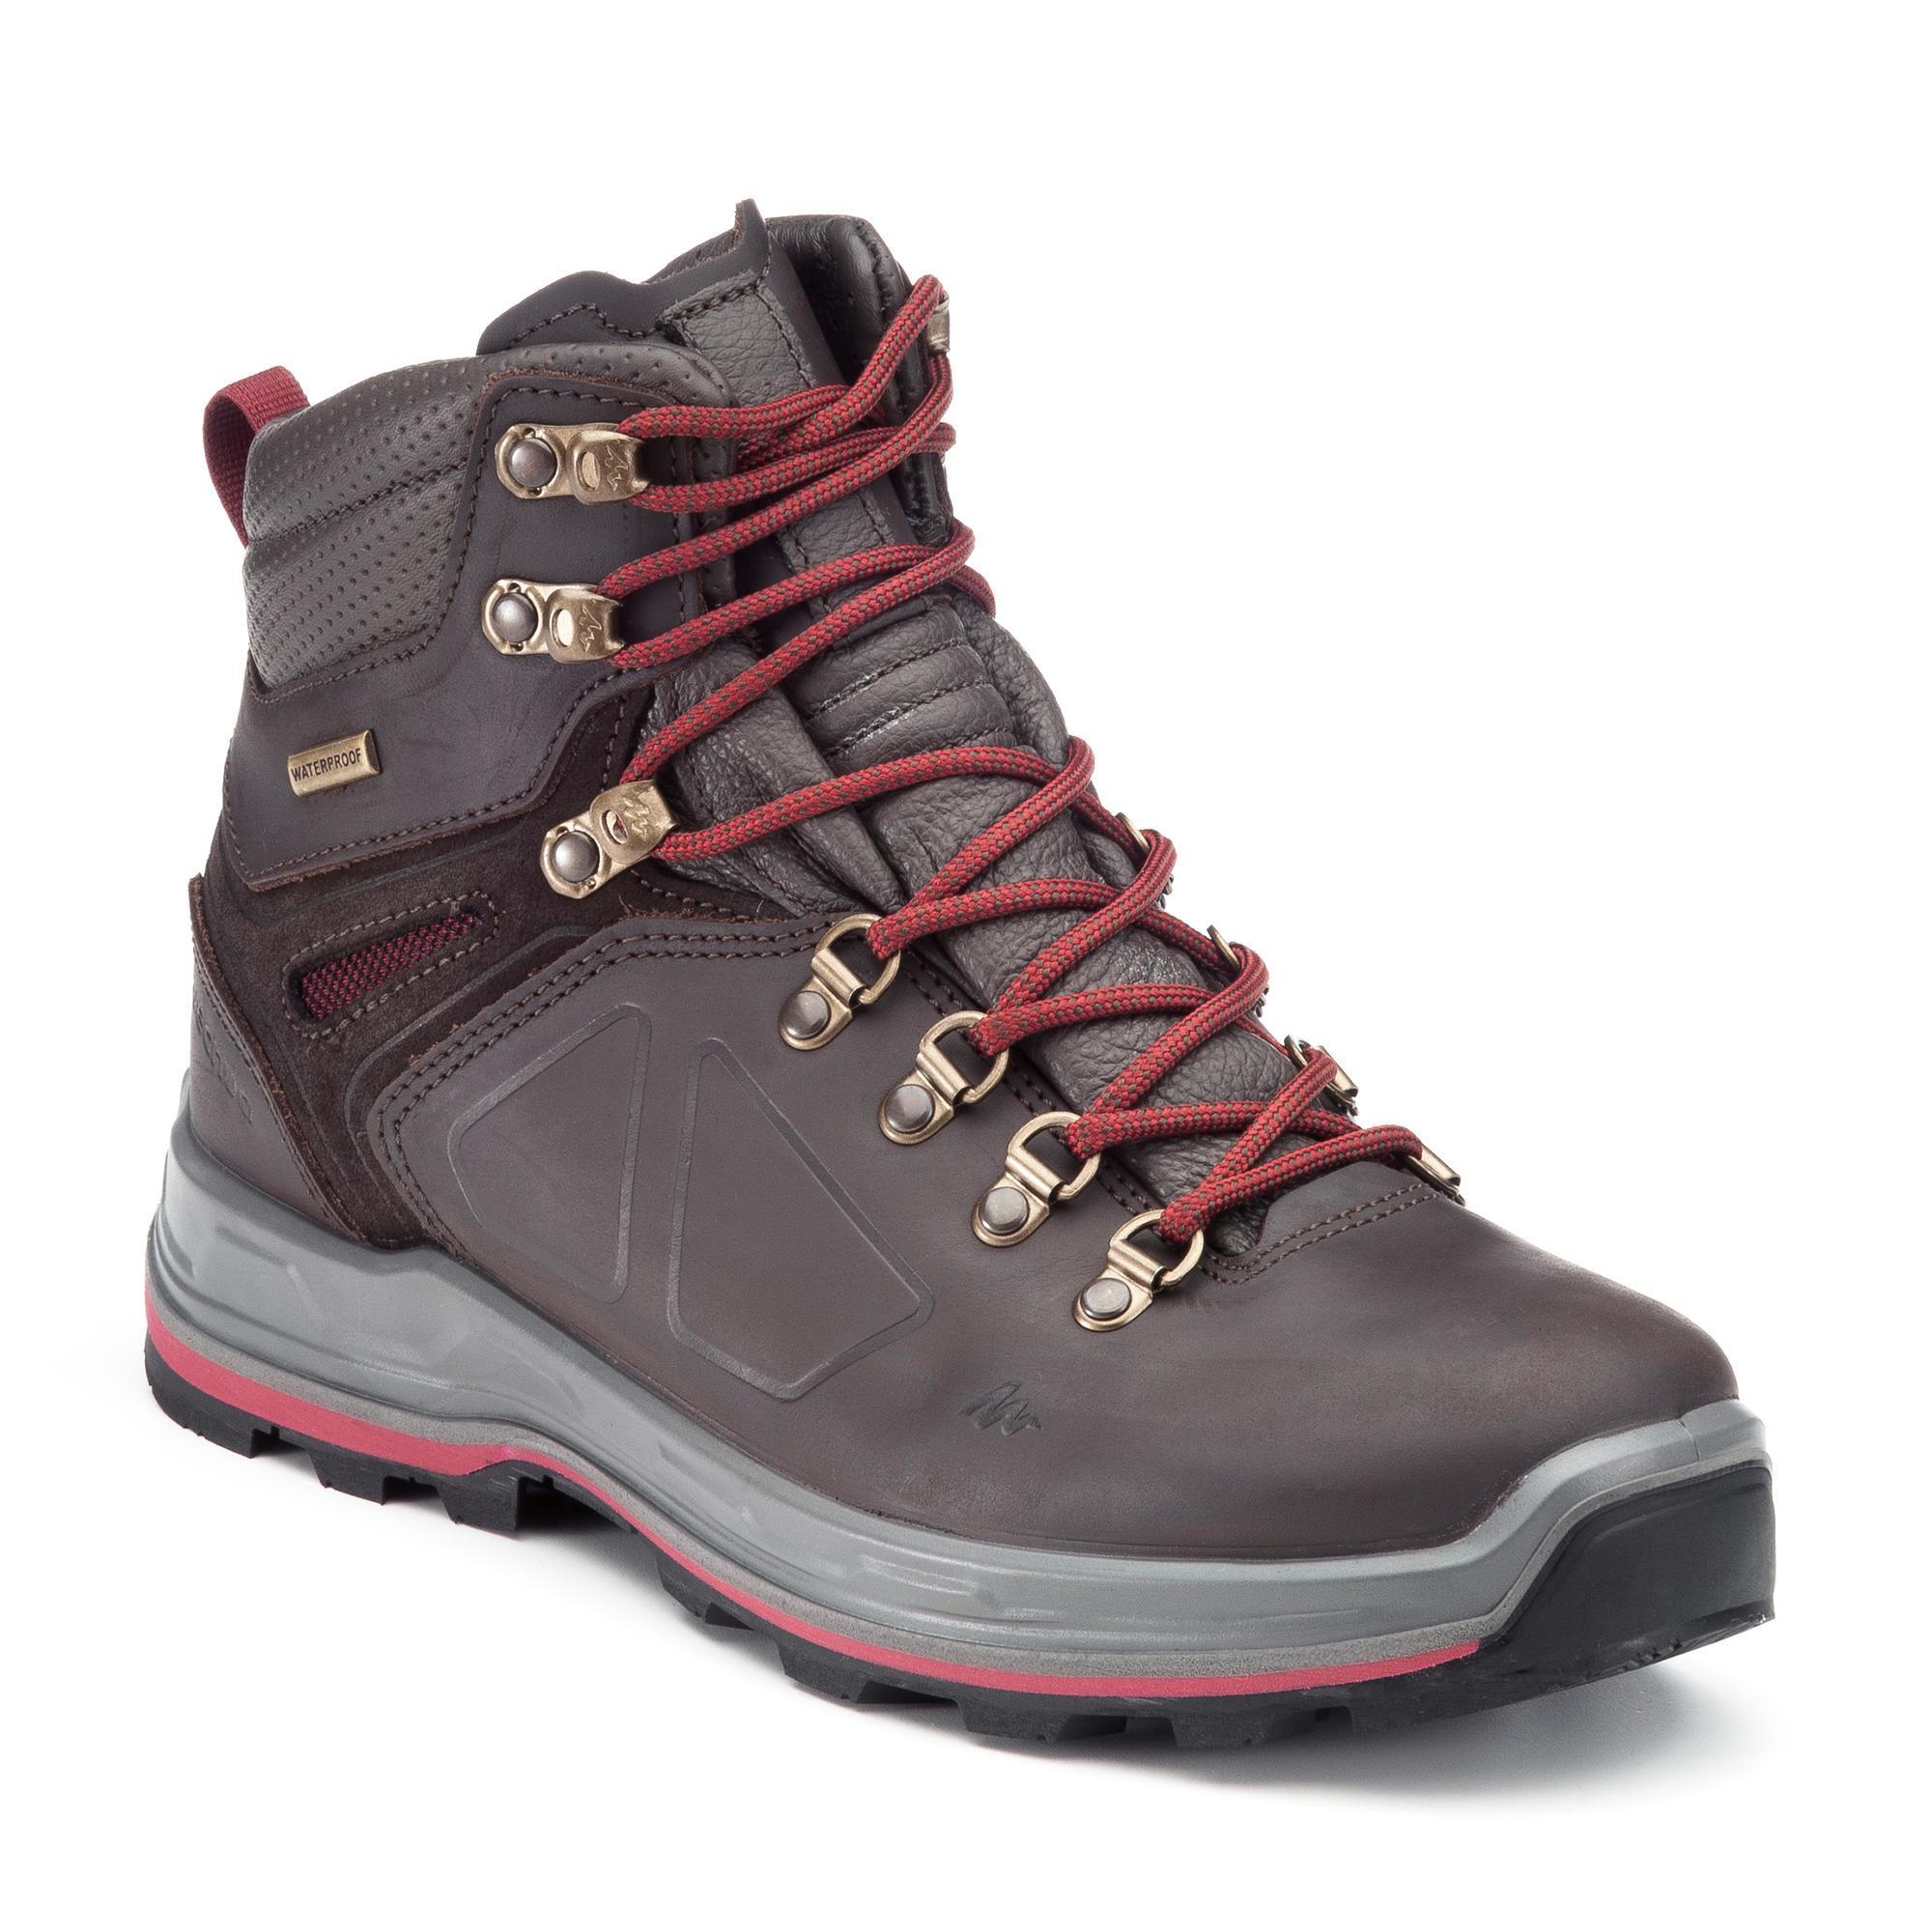 timeless design d8bd0 998ab Comprar Botas de montaña y trekking TREK500 mujer   Decathlon